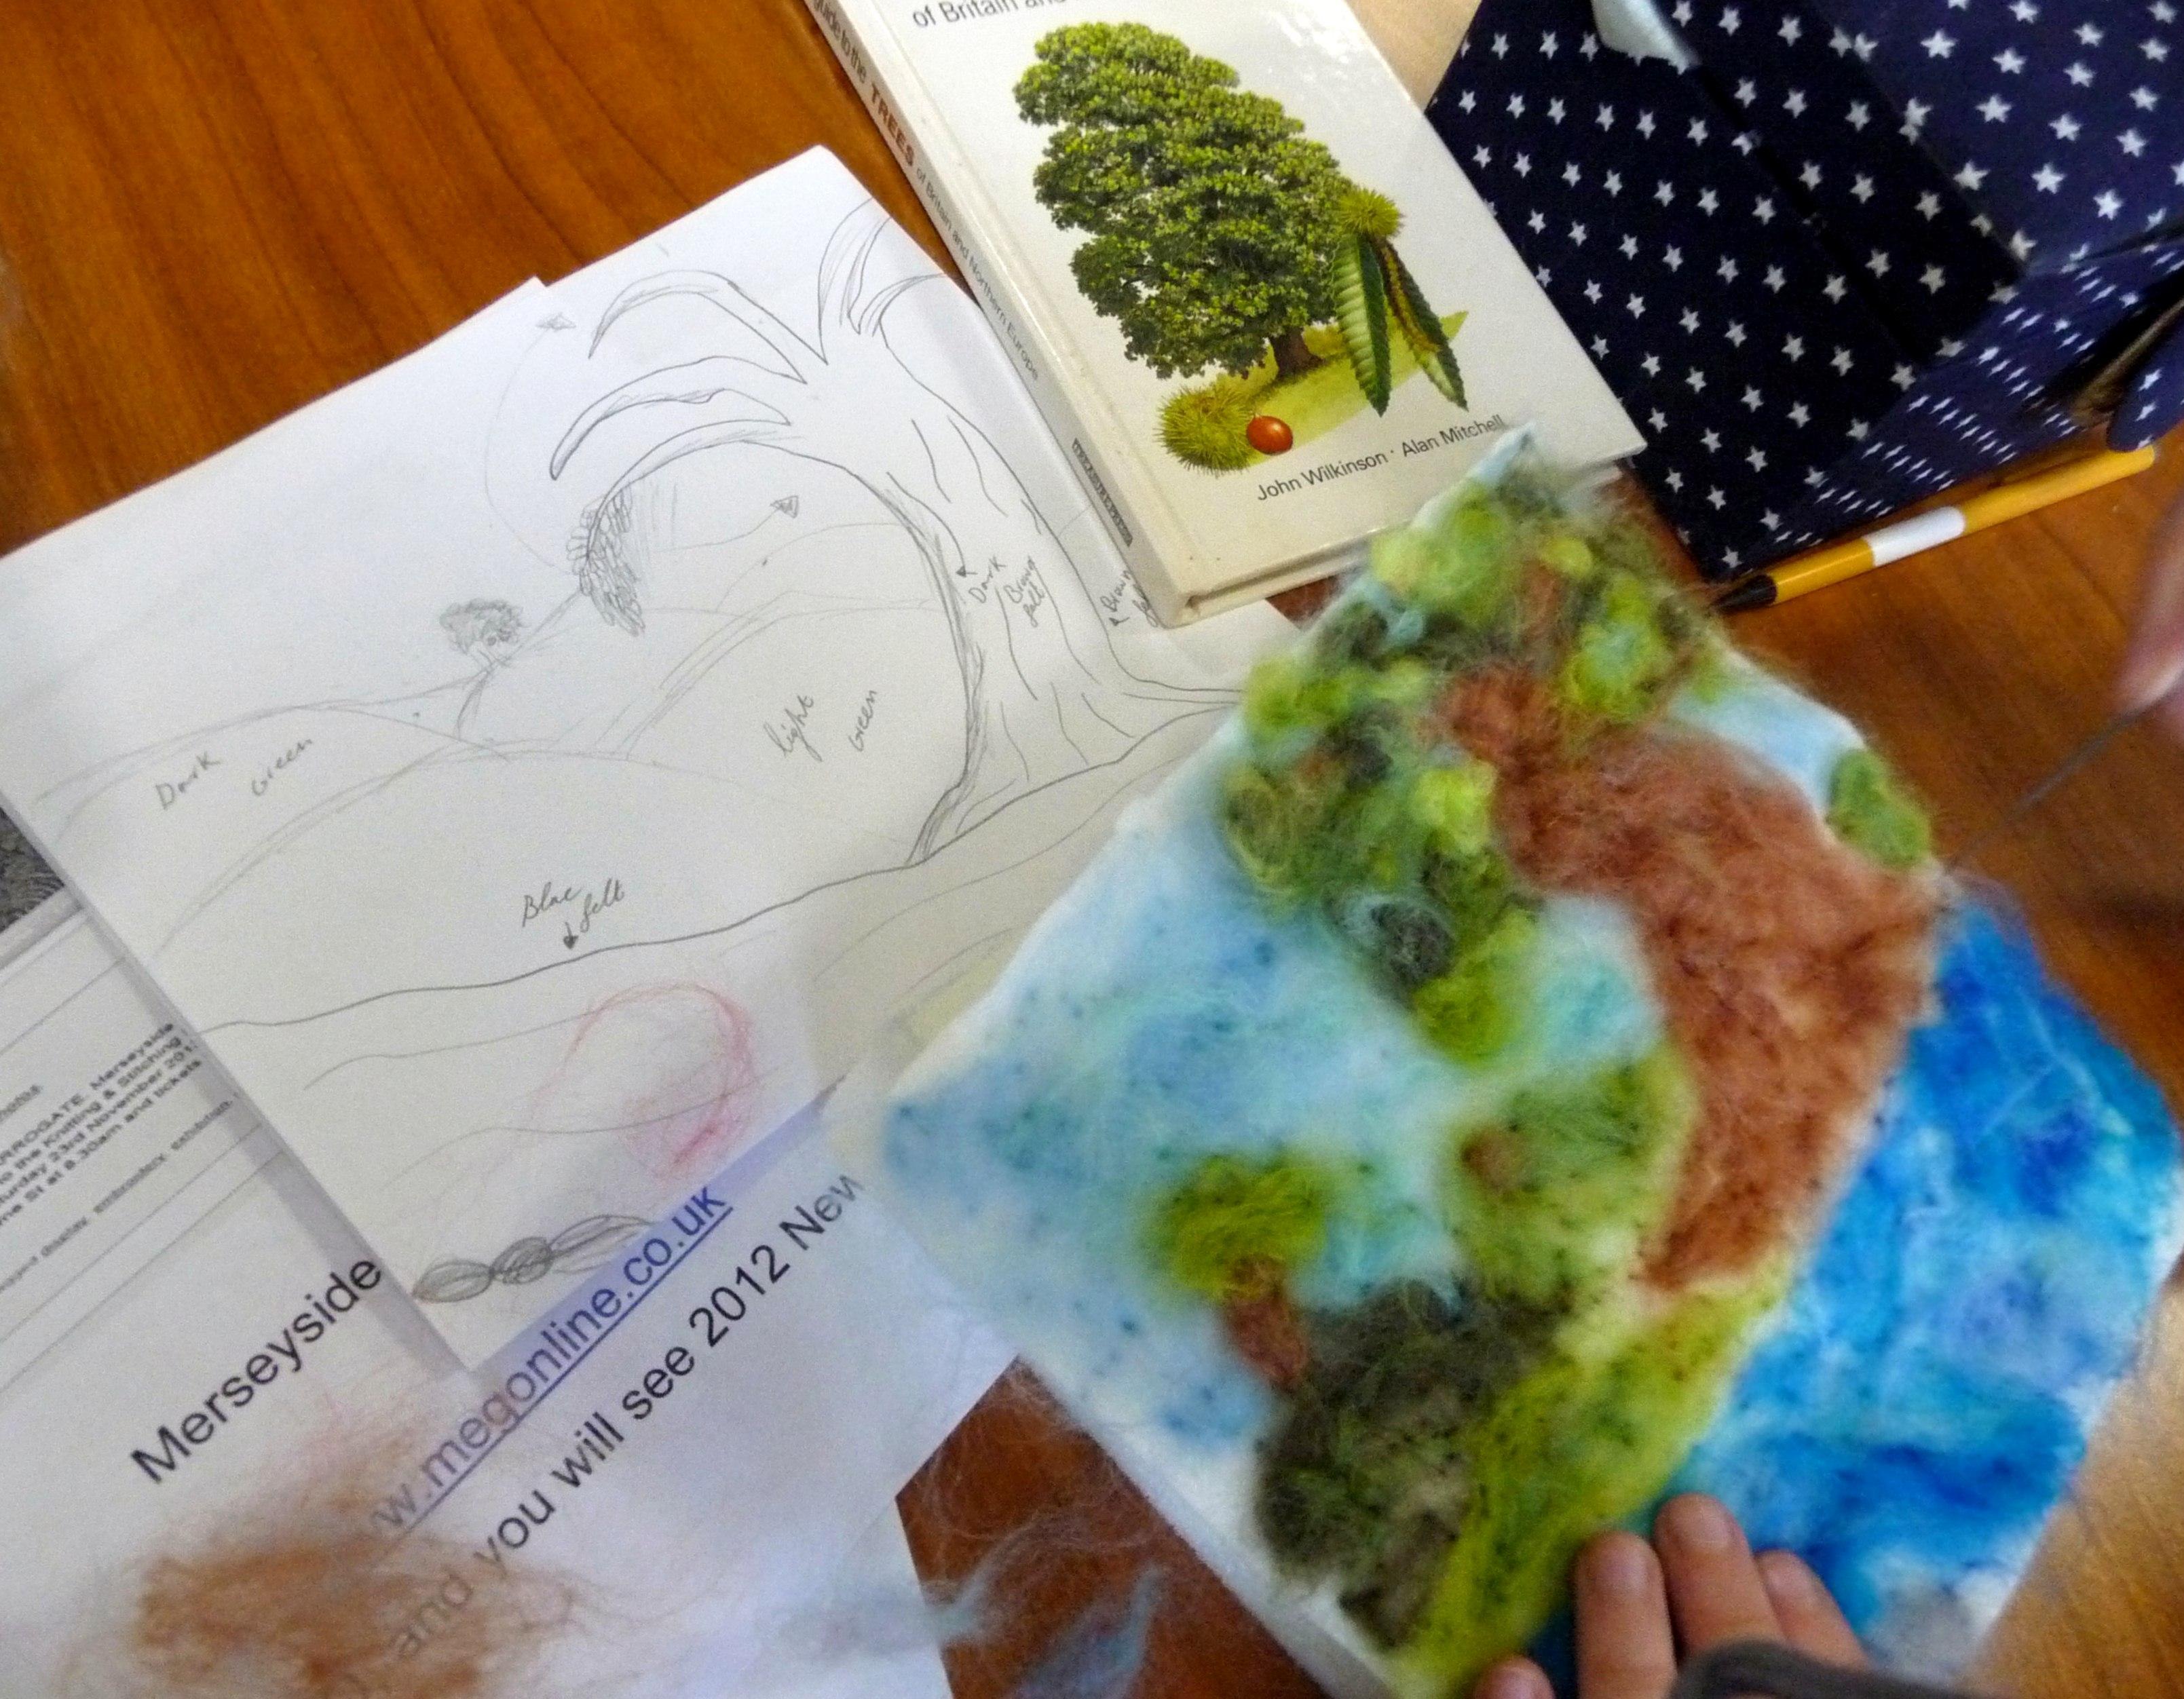 each YE member drew a plan of their landscape before needlefelting